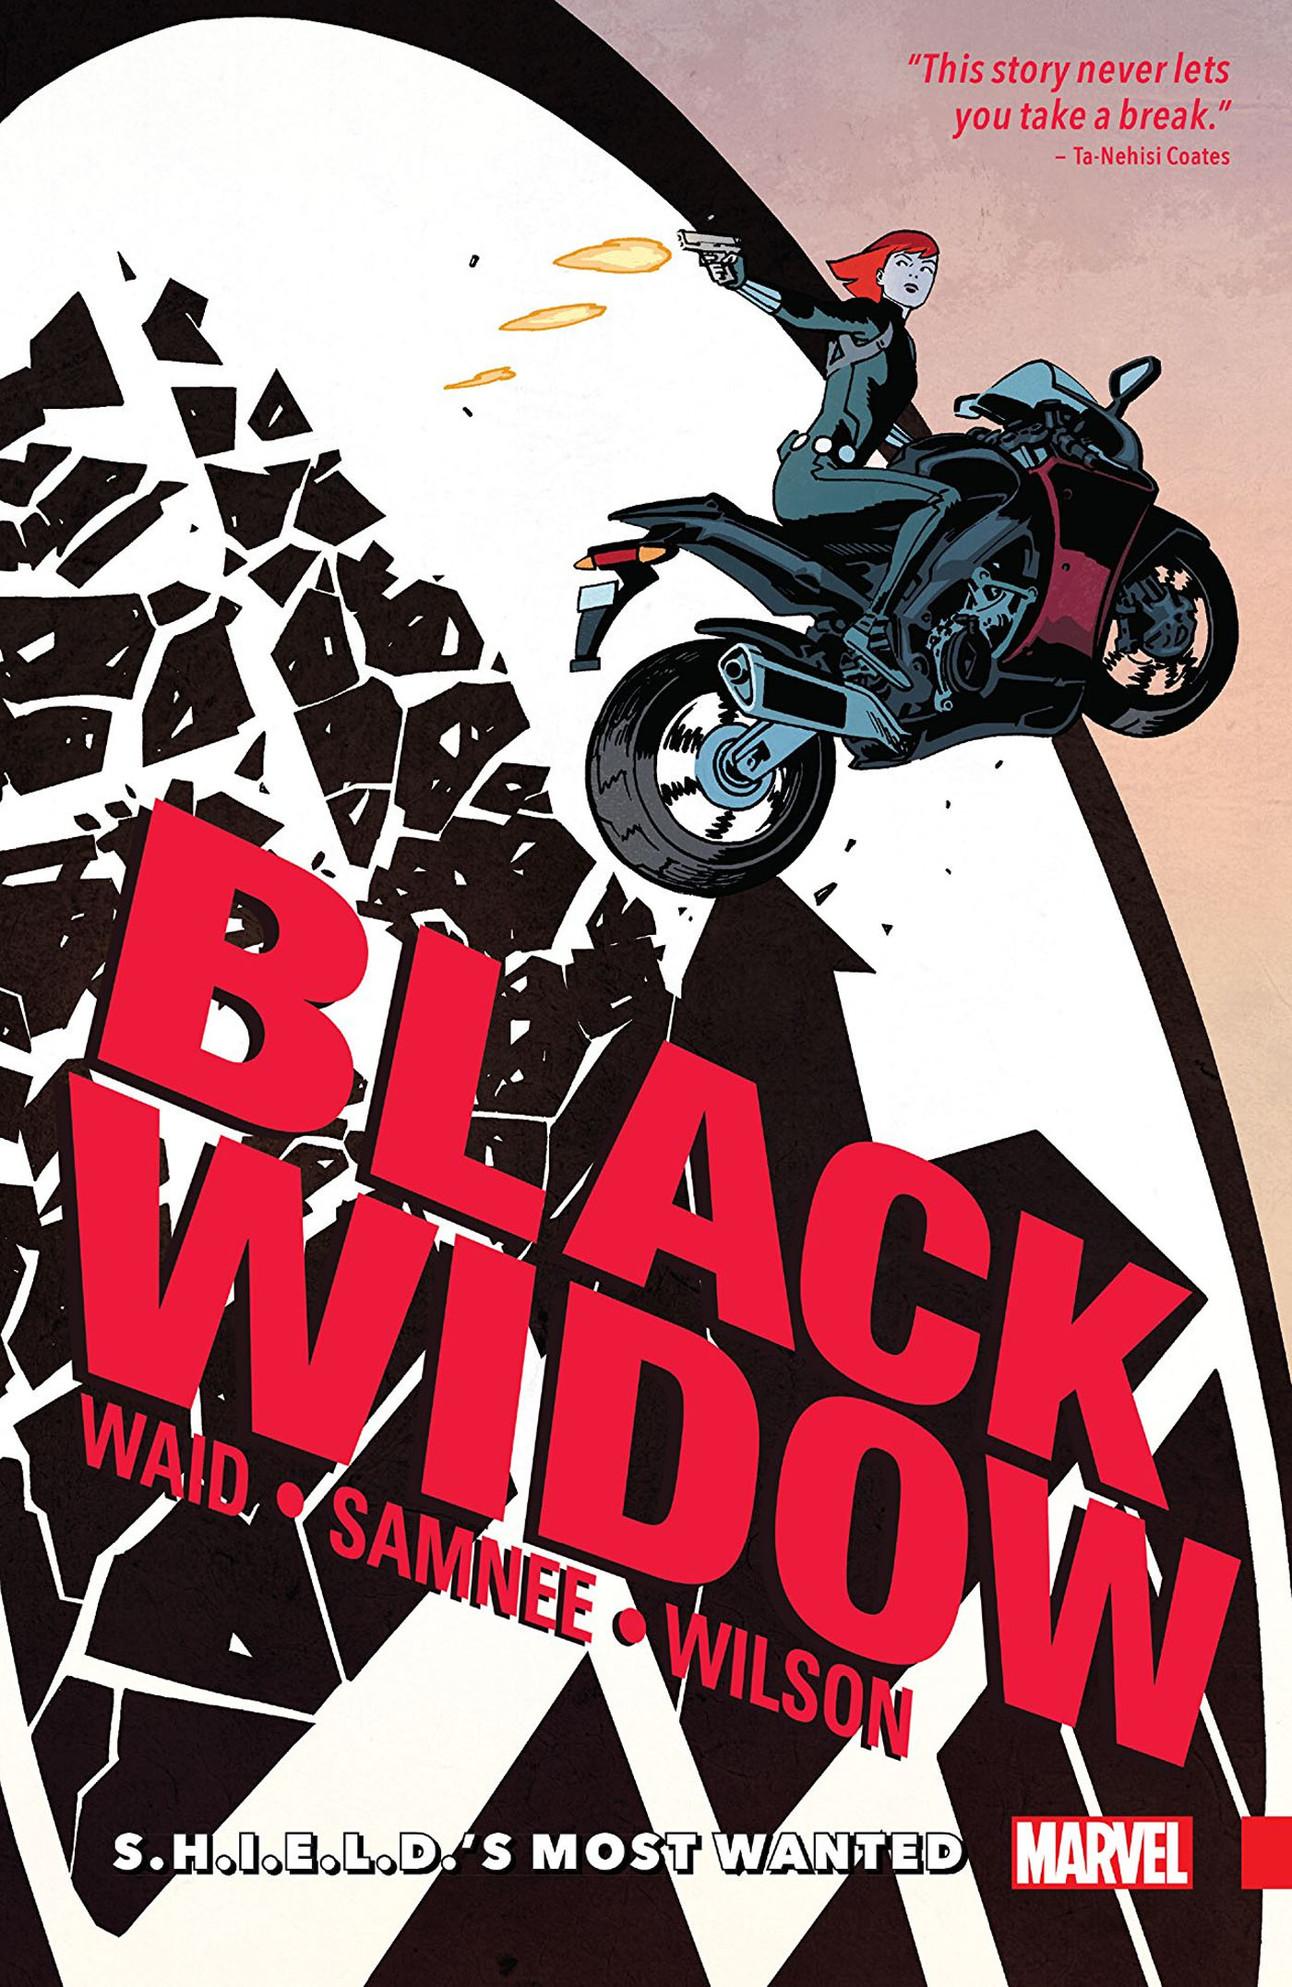 black_widow_shields_most_wanted.jpg